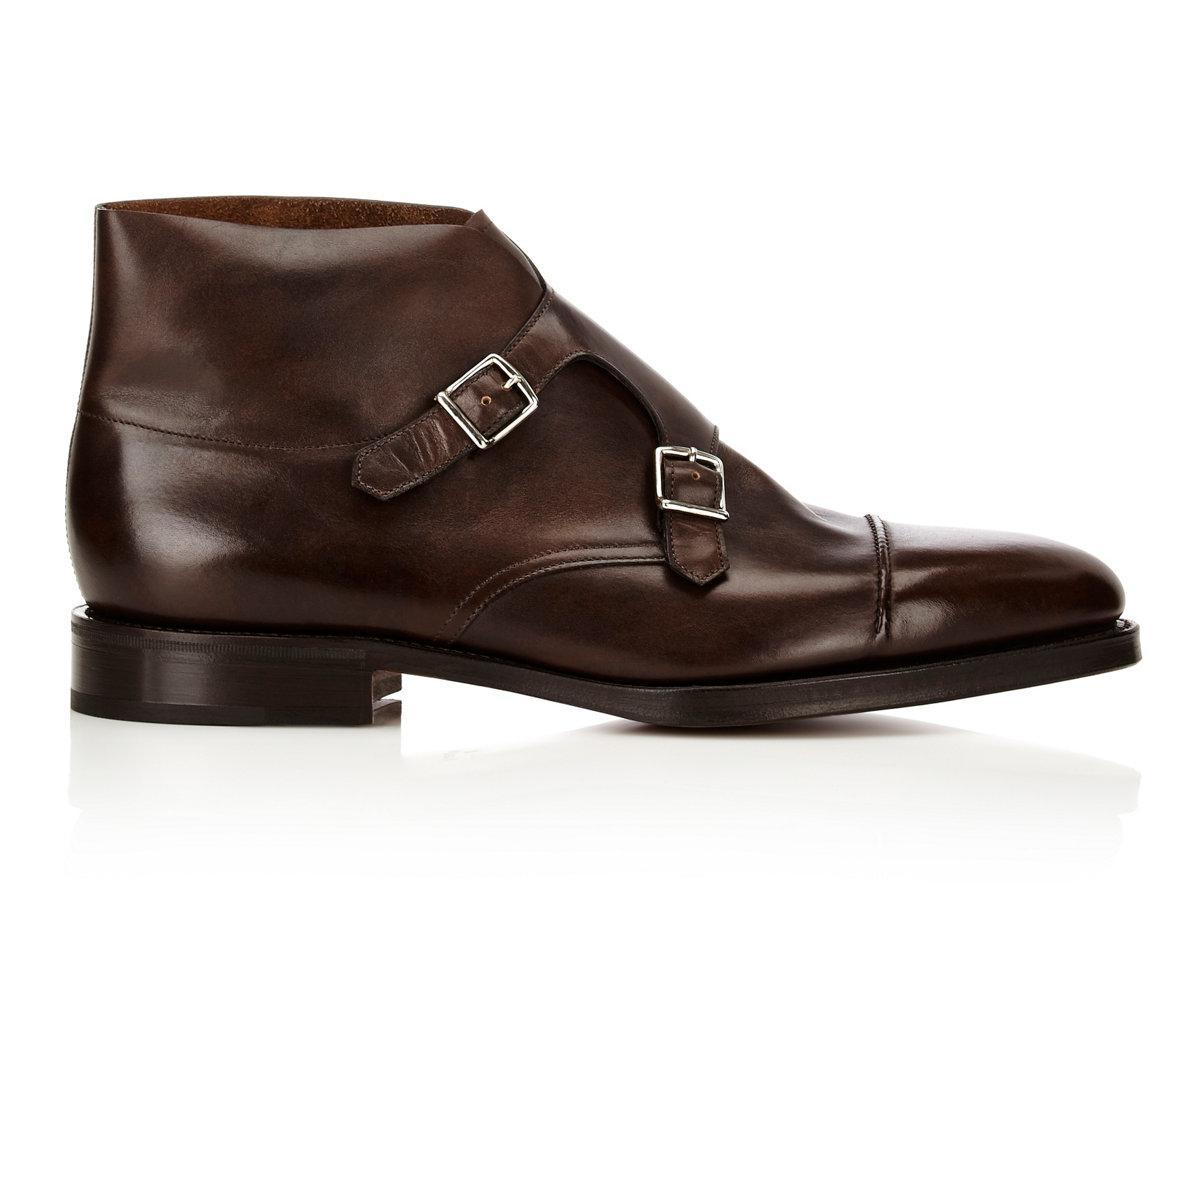 Mens William II Double-Monk-Strap Boots John Lobb wMJRsKGp